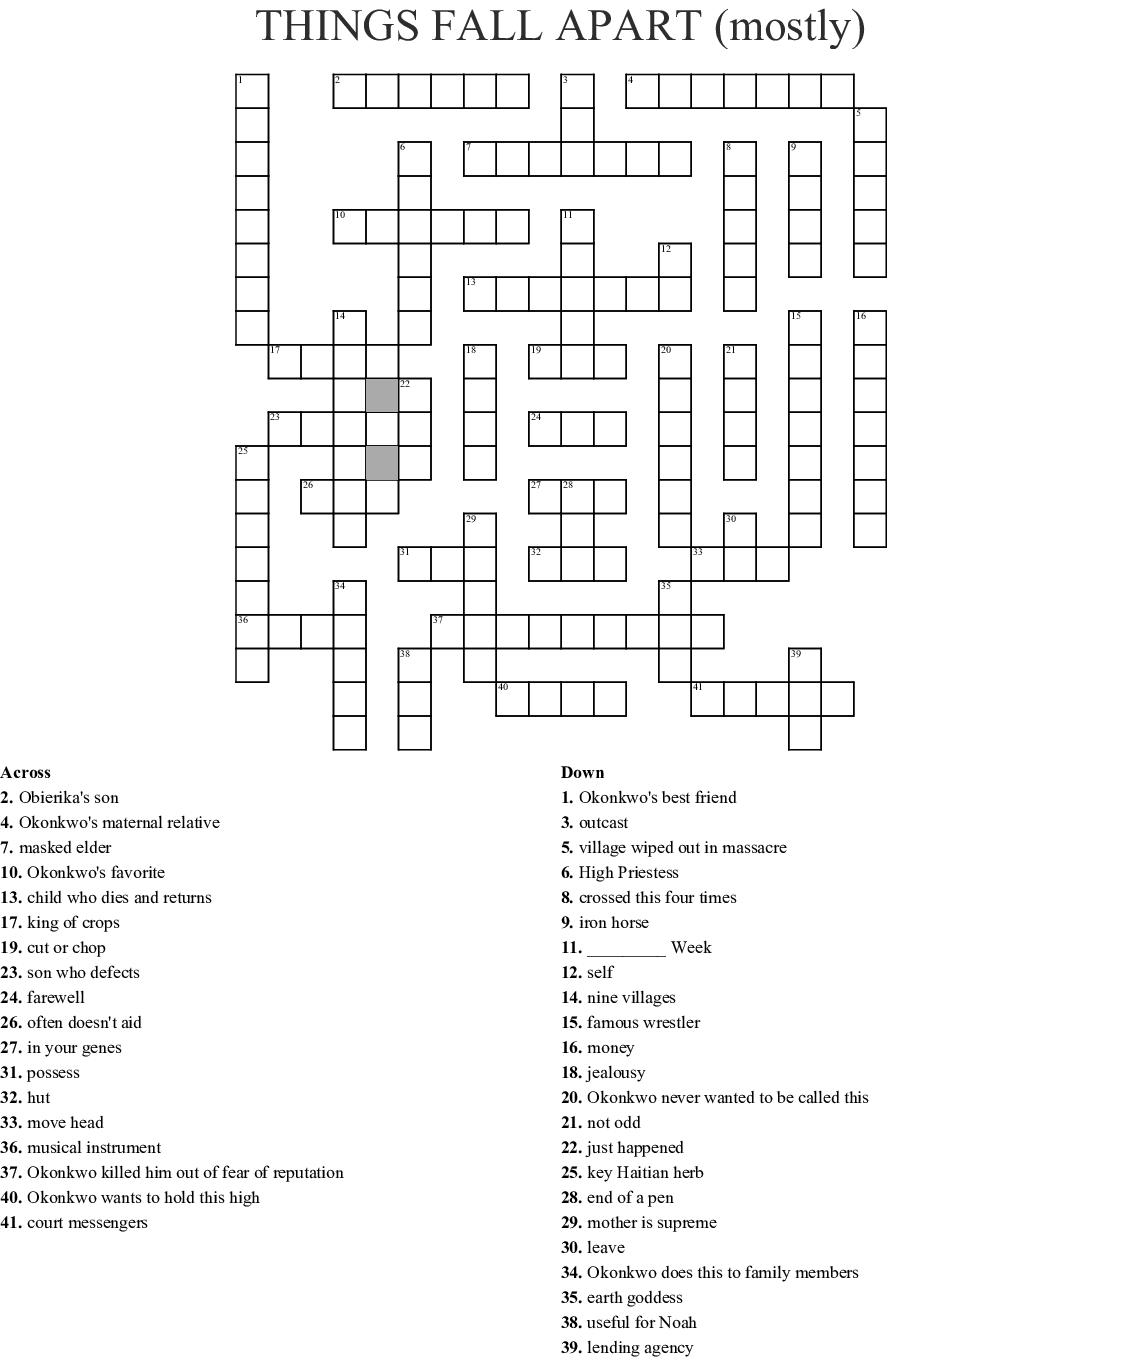 Things Fall Apart Crossword